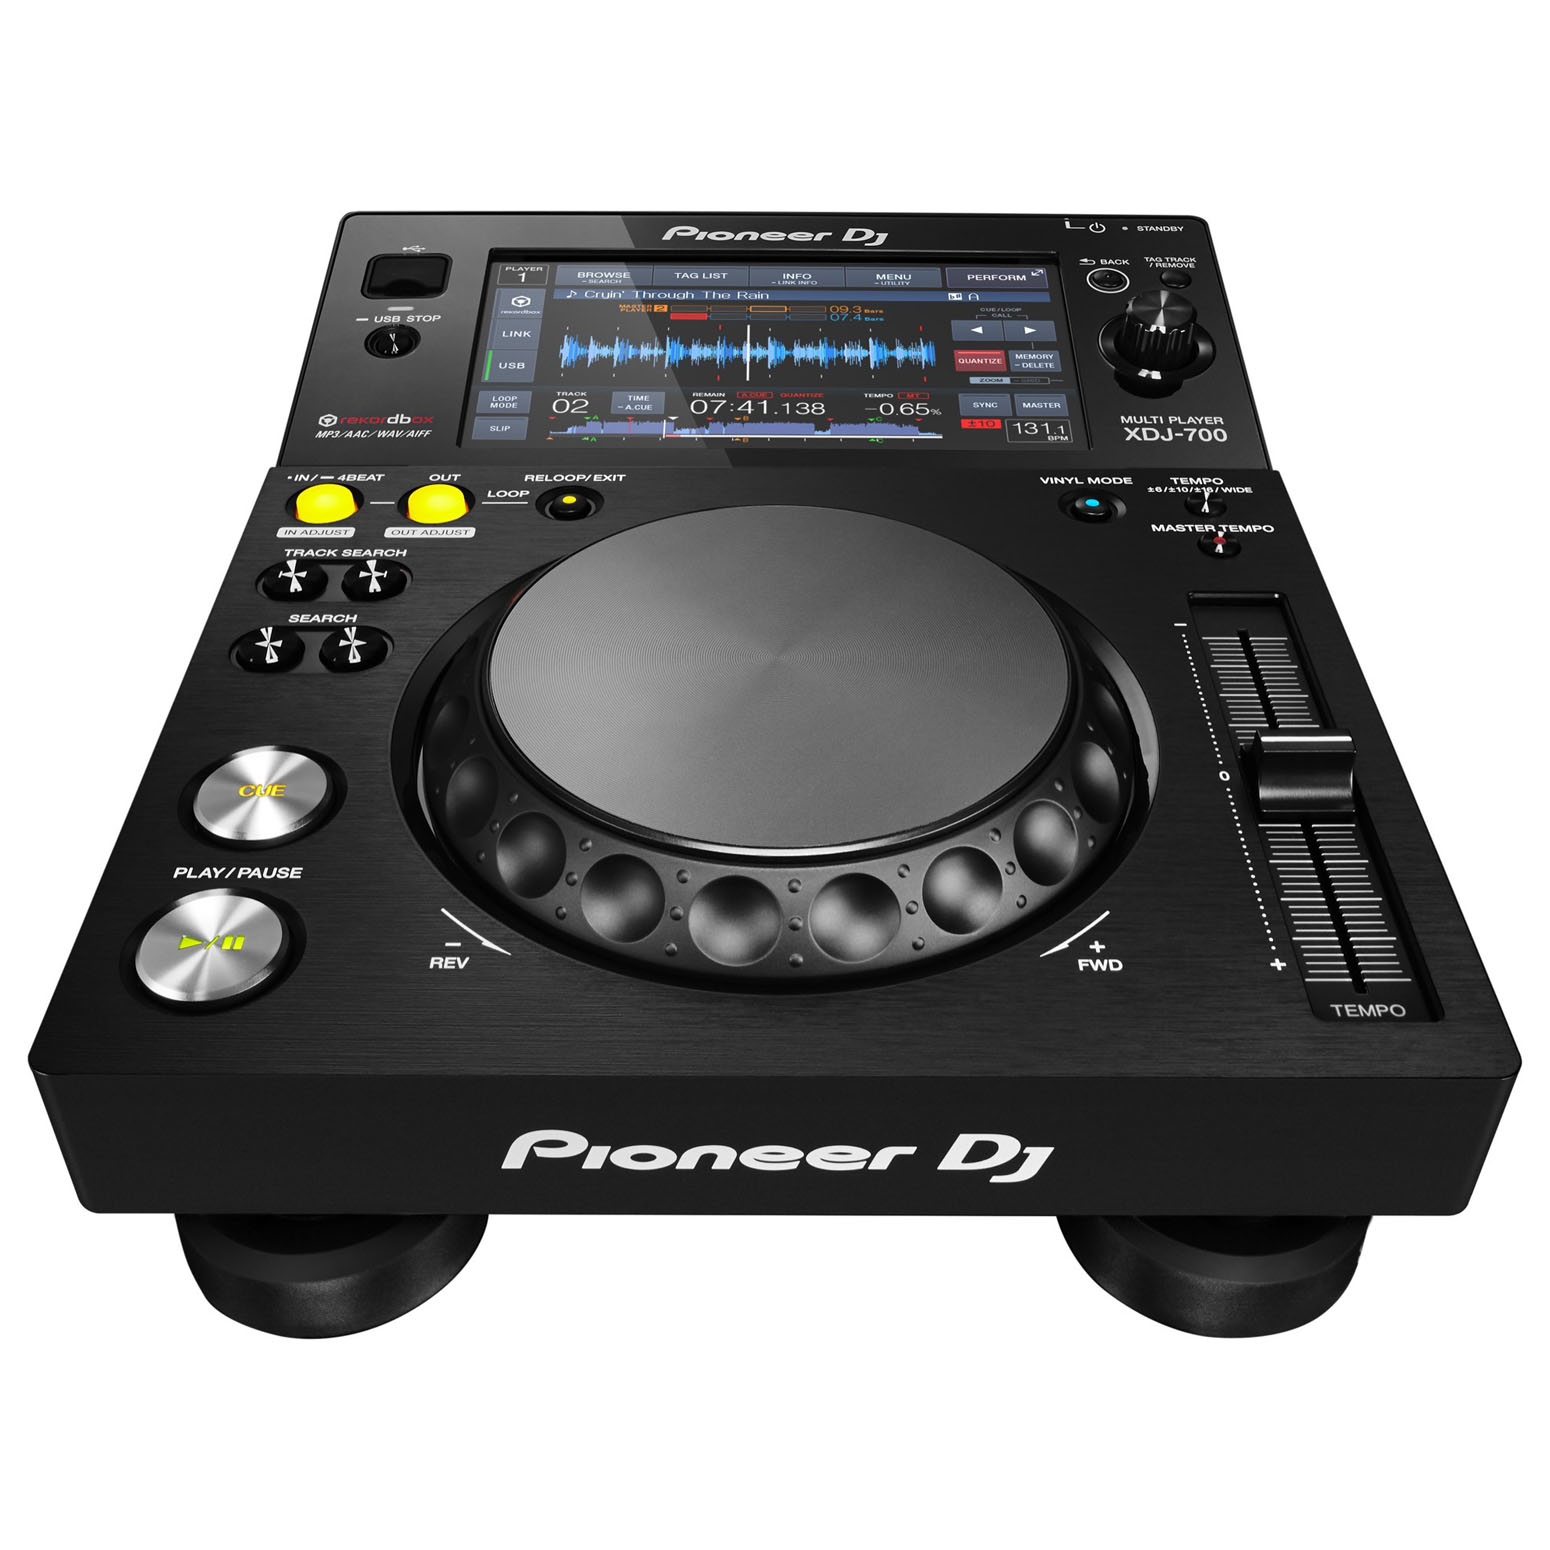 CDJ/MP3 Players